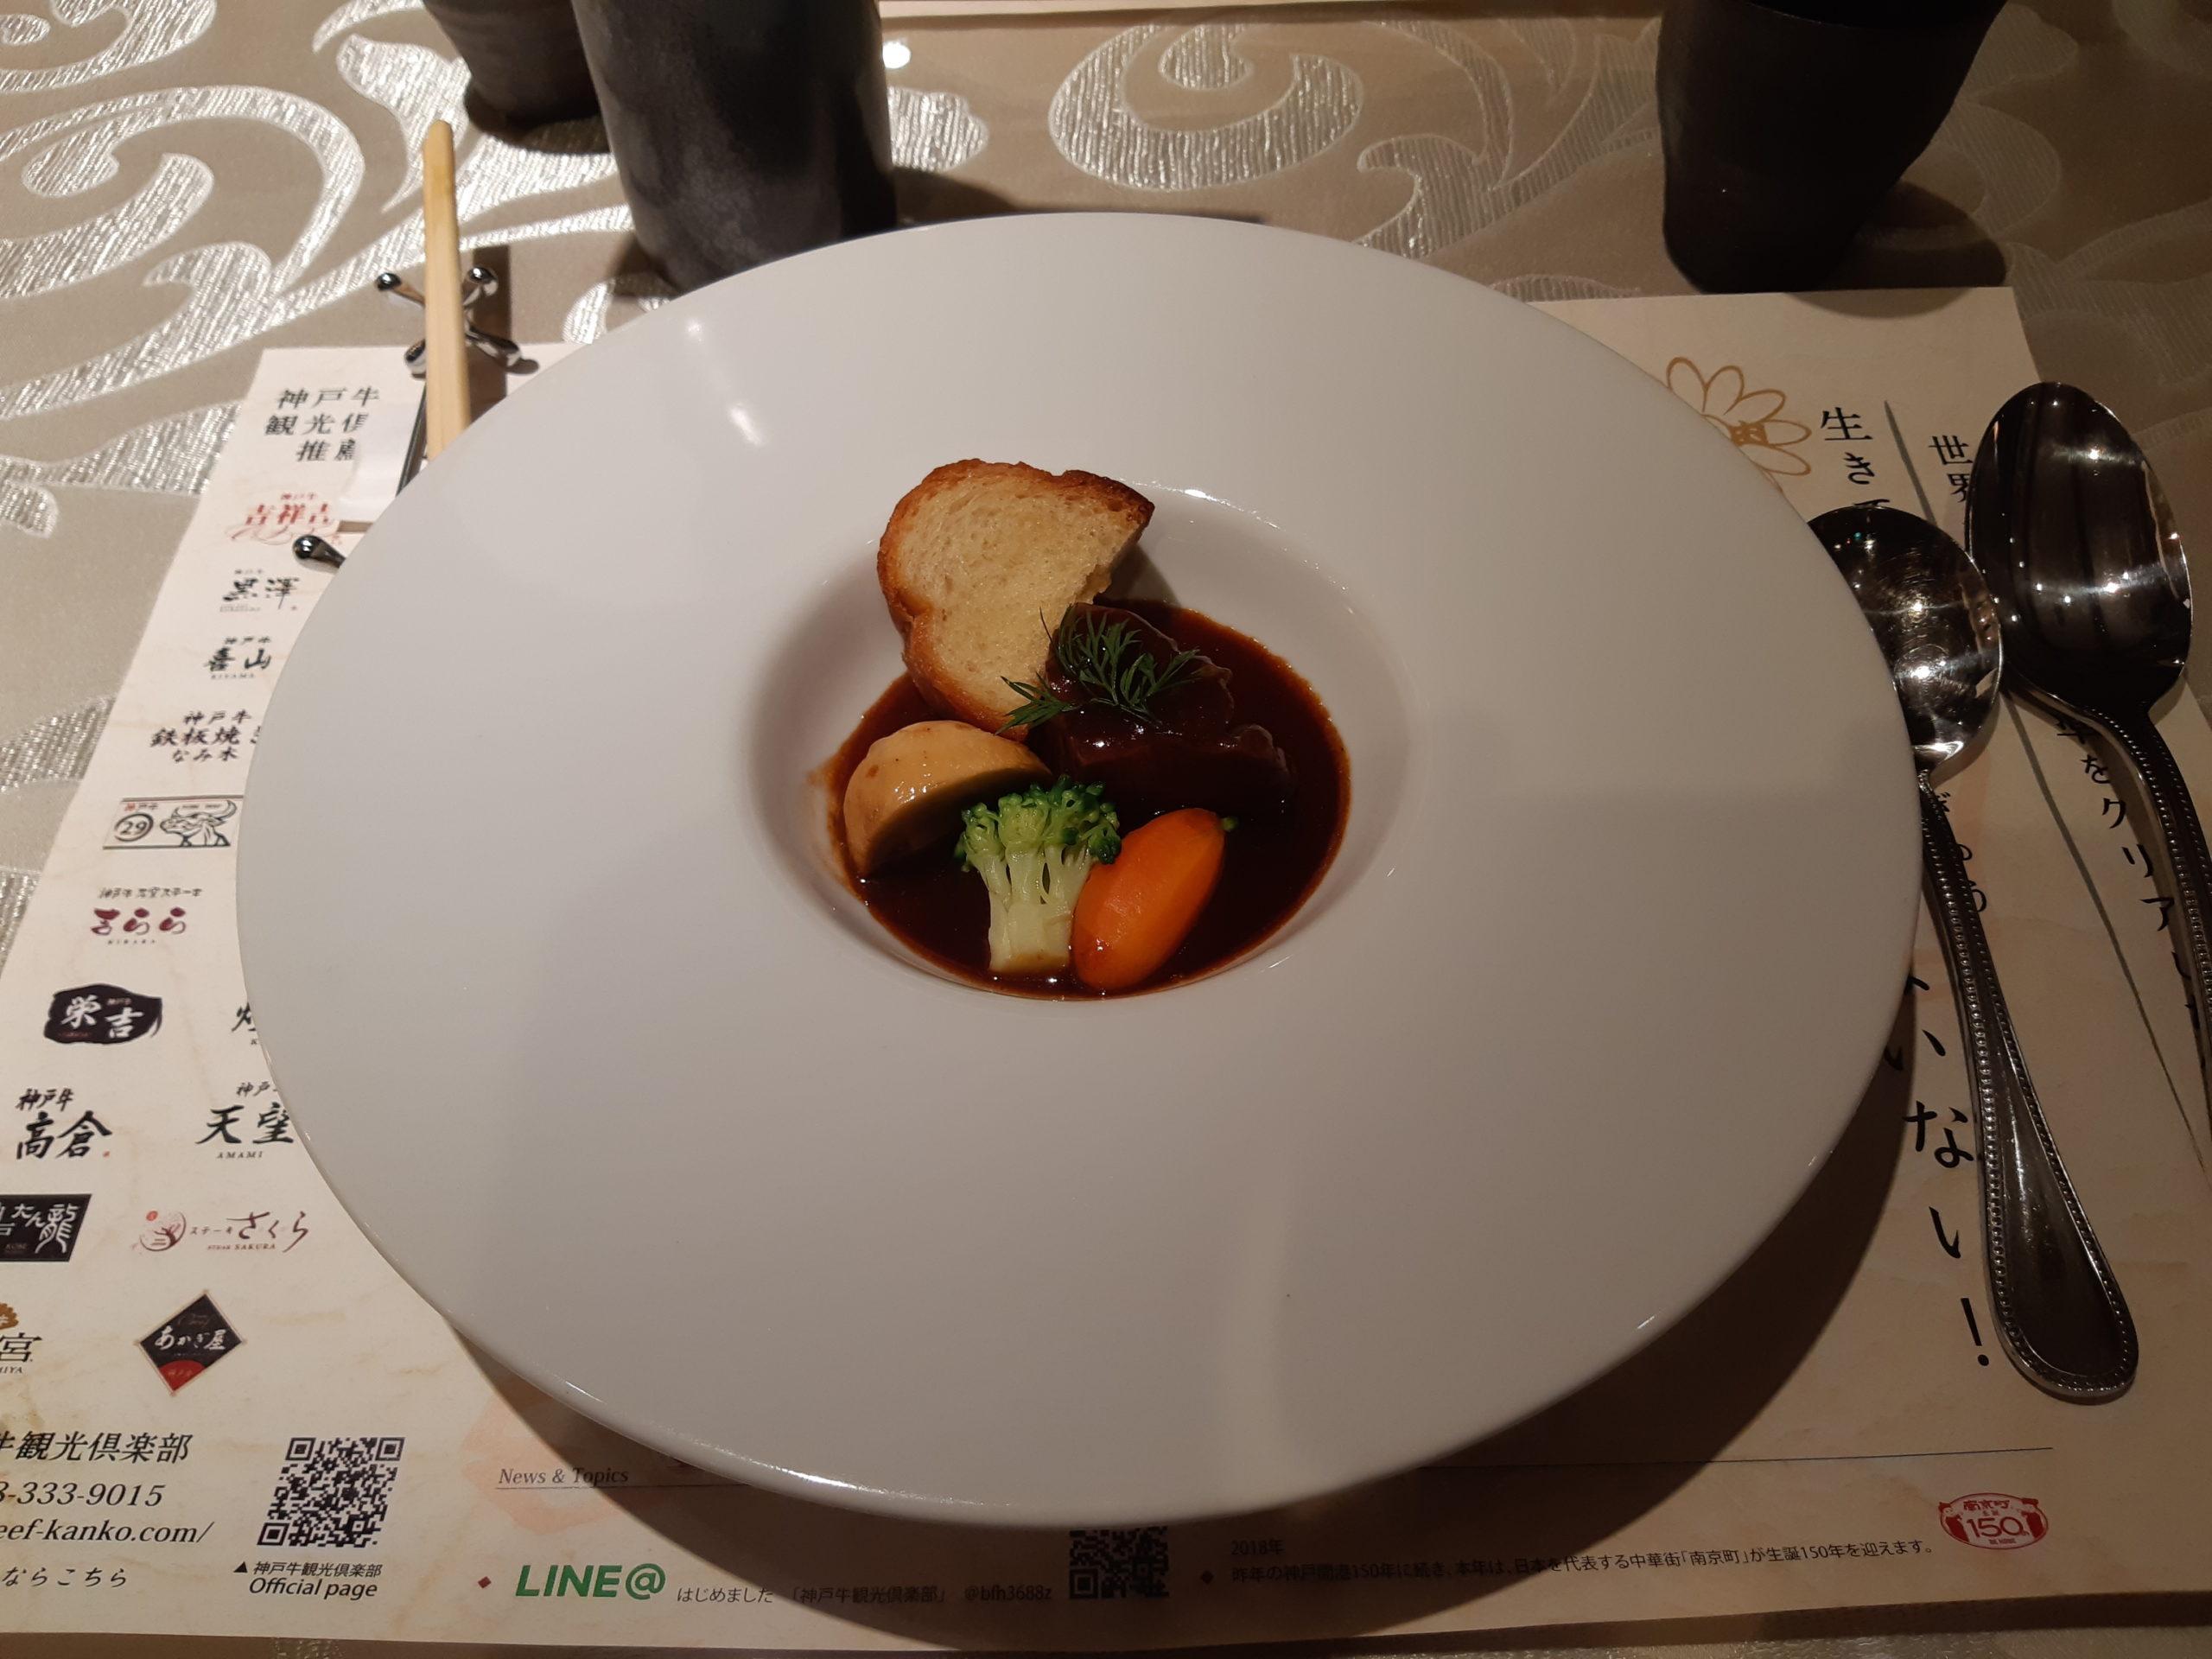 Bourguignon Kobe